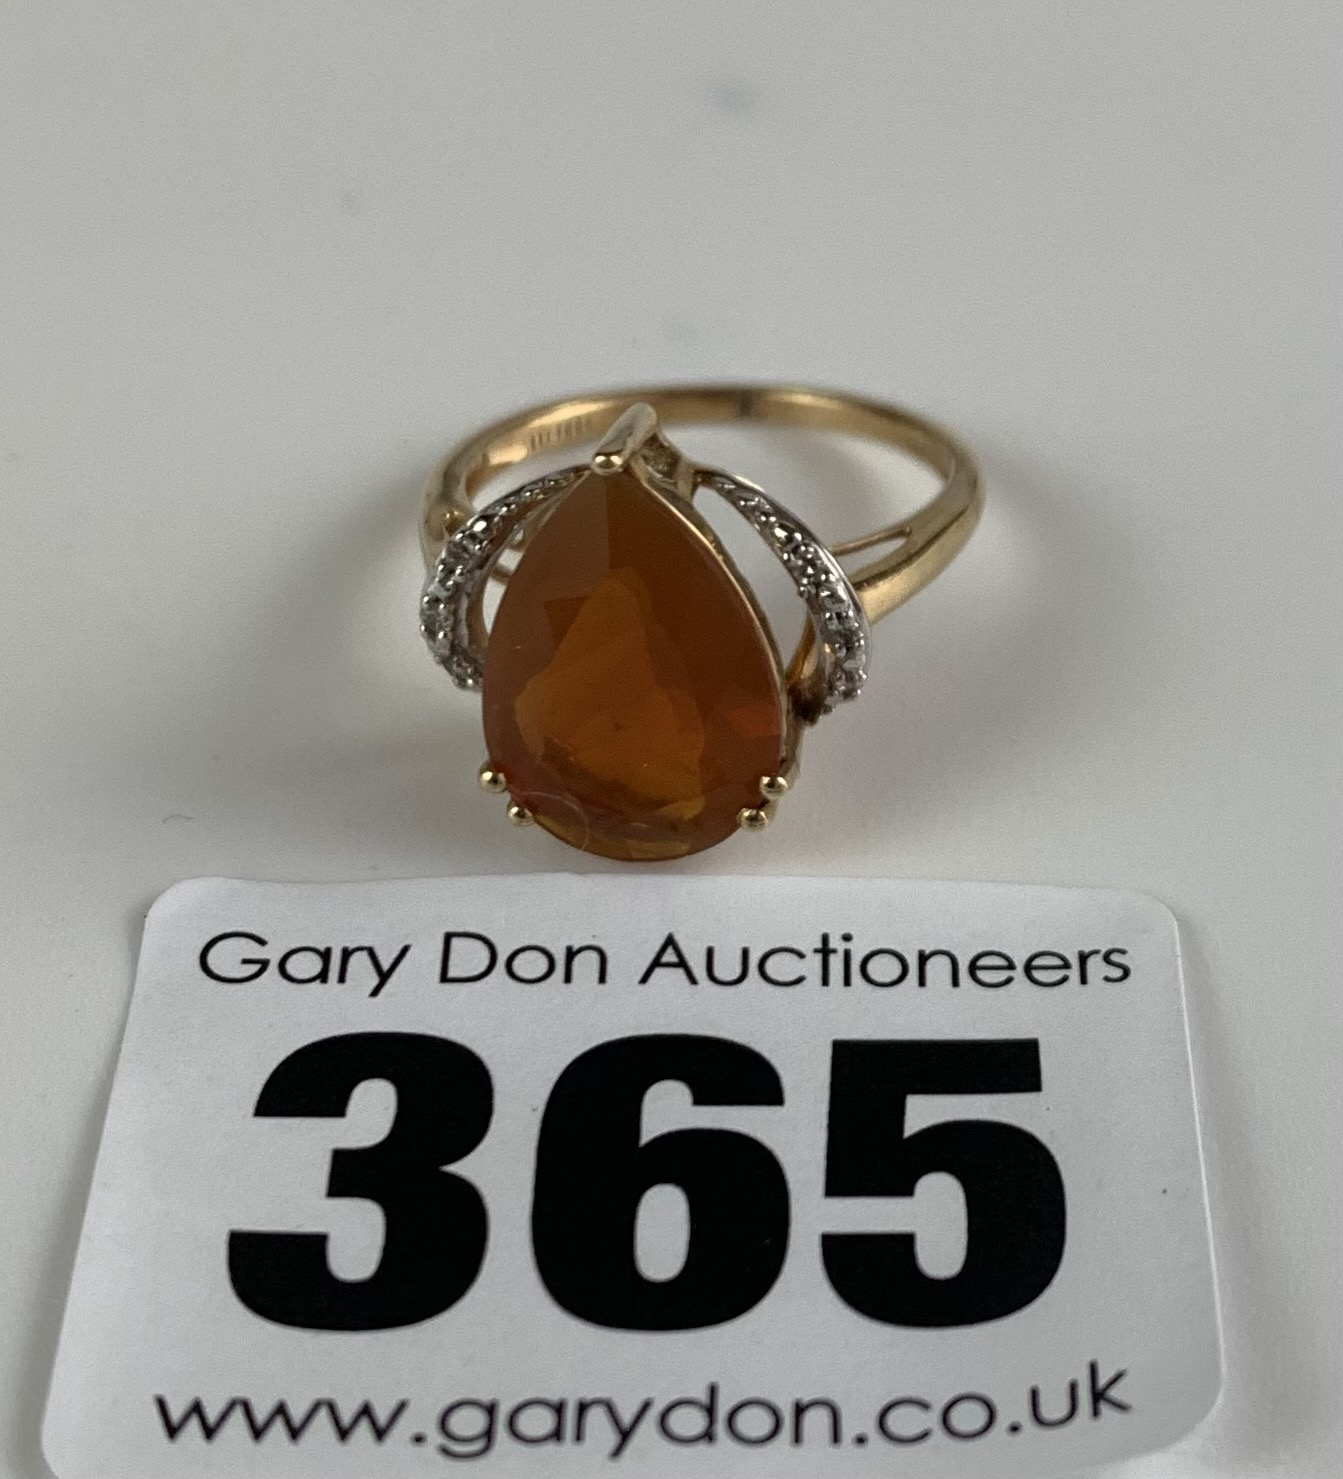 10k gold ring with heart shaped orange stone, size J/K, w: 2.1 gms - Image 4 of 6